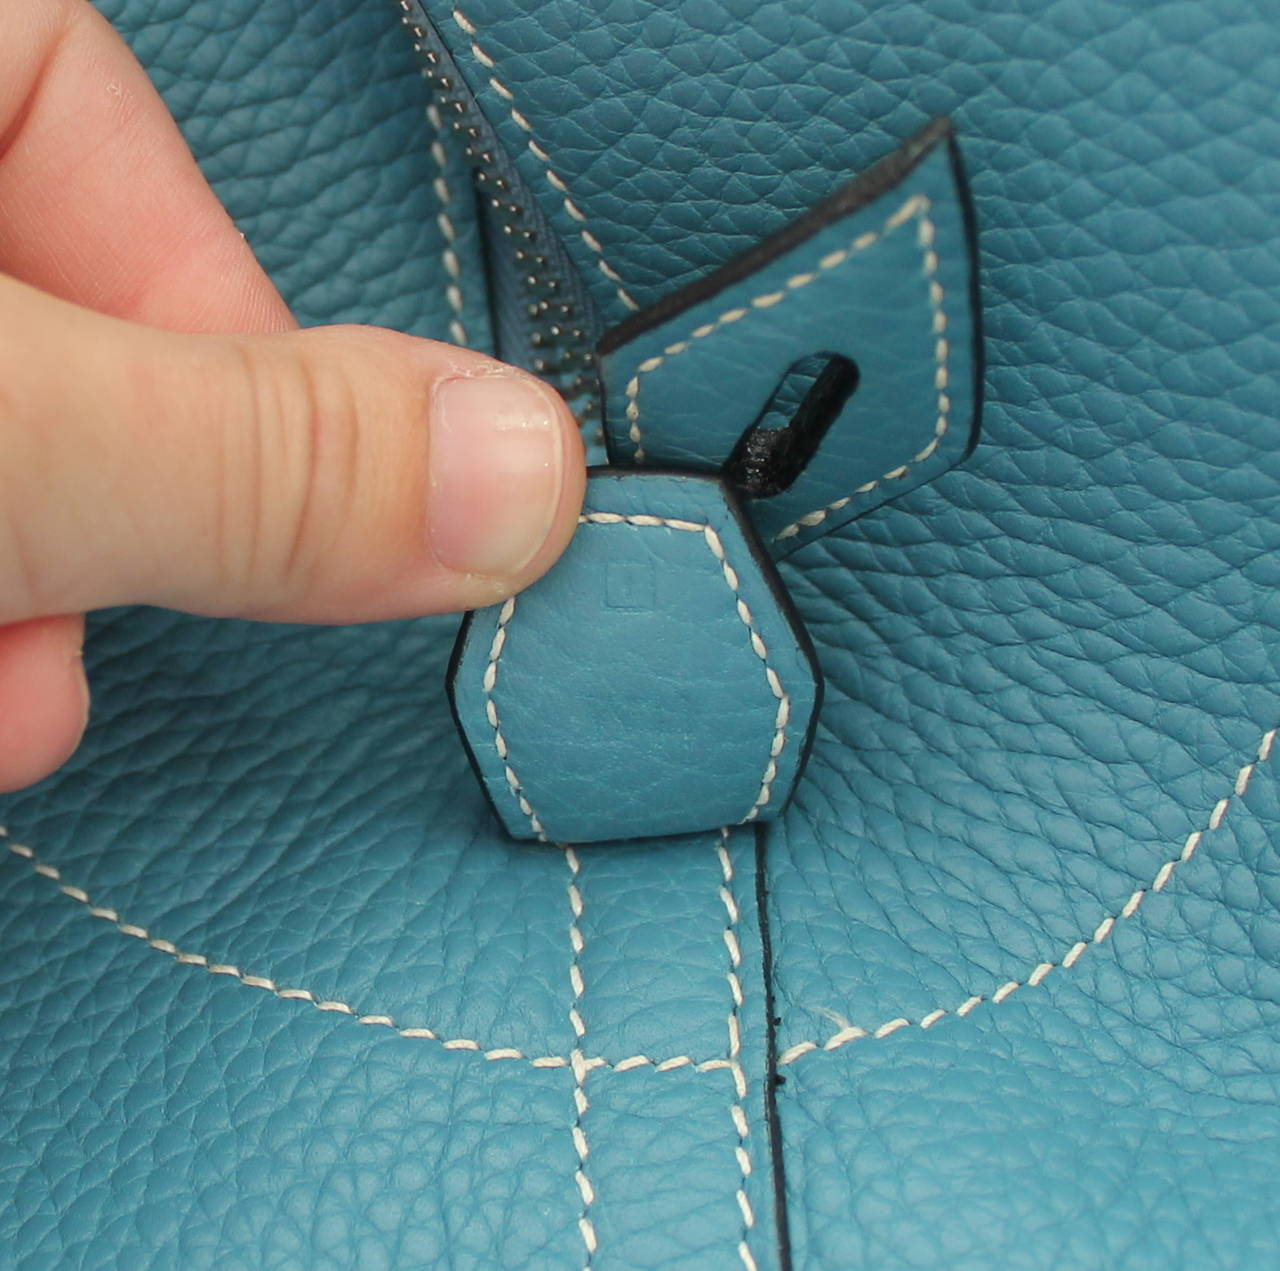 replica hermes birkin 40 - hermes 45 cm bolide travel bag